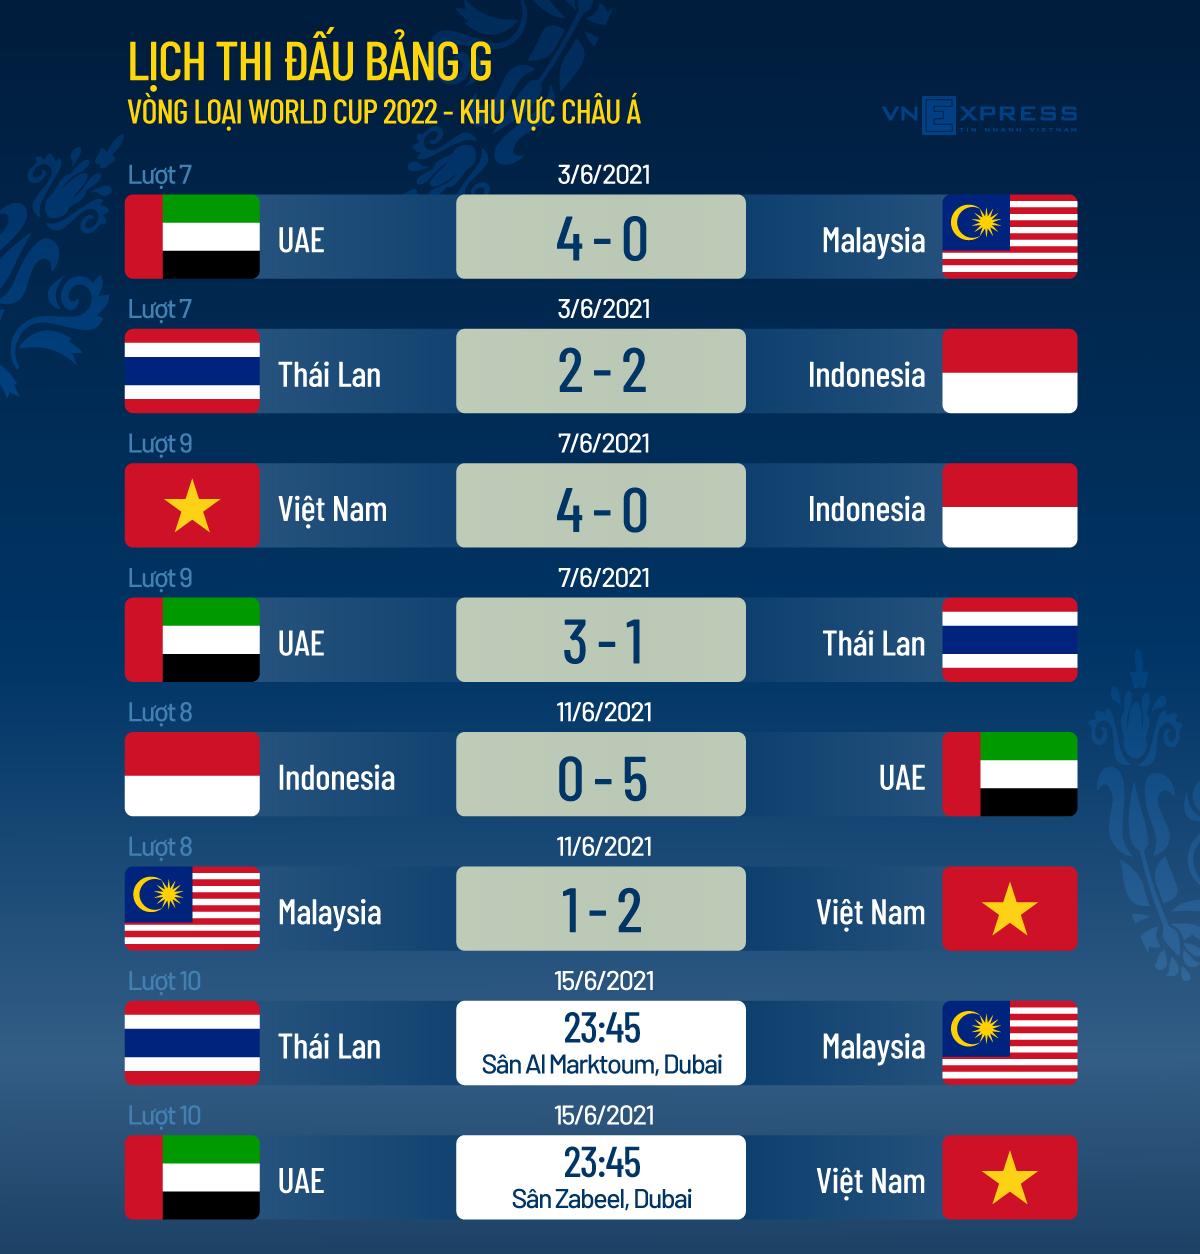 UAE ชนะอินโดนีเซียอย่างง่ายดาย - หน้า 2 - 2